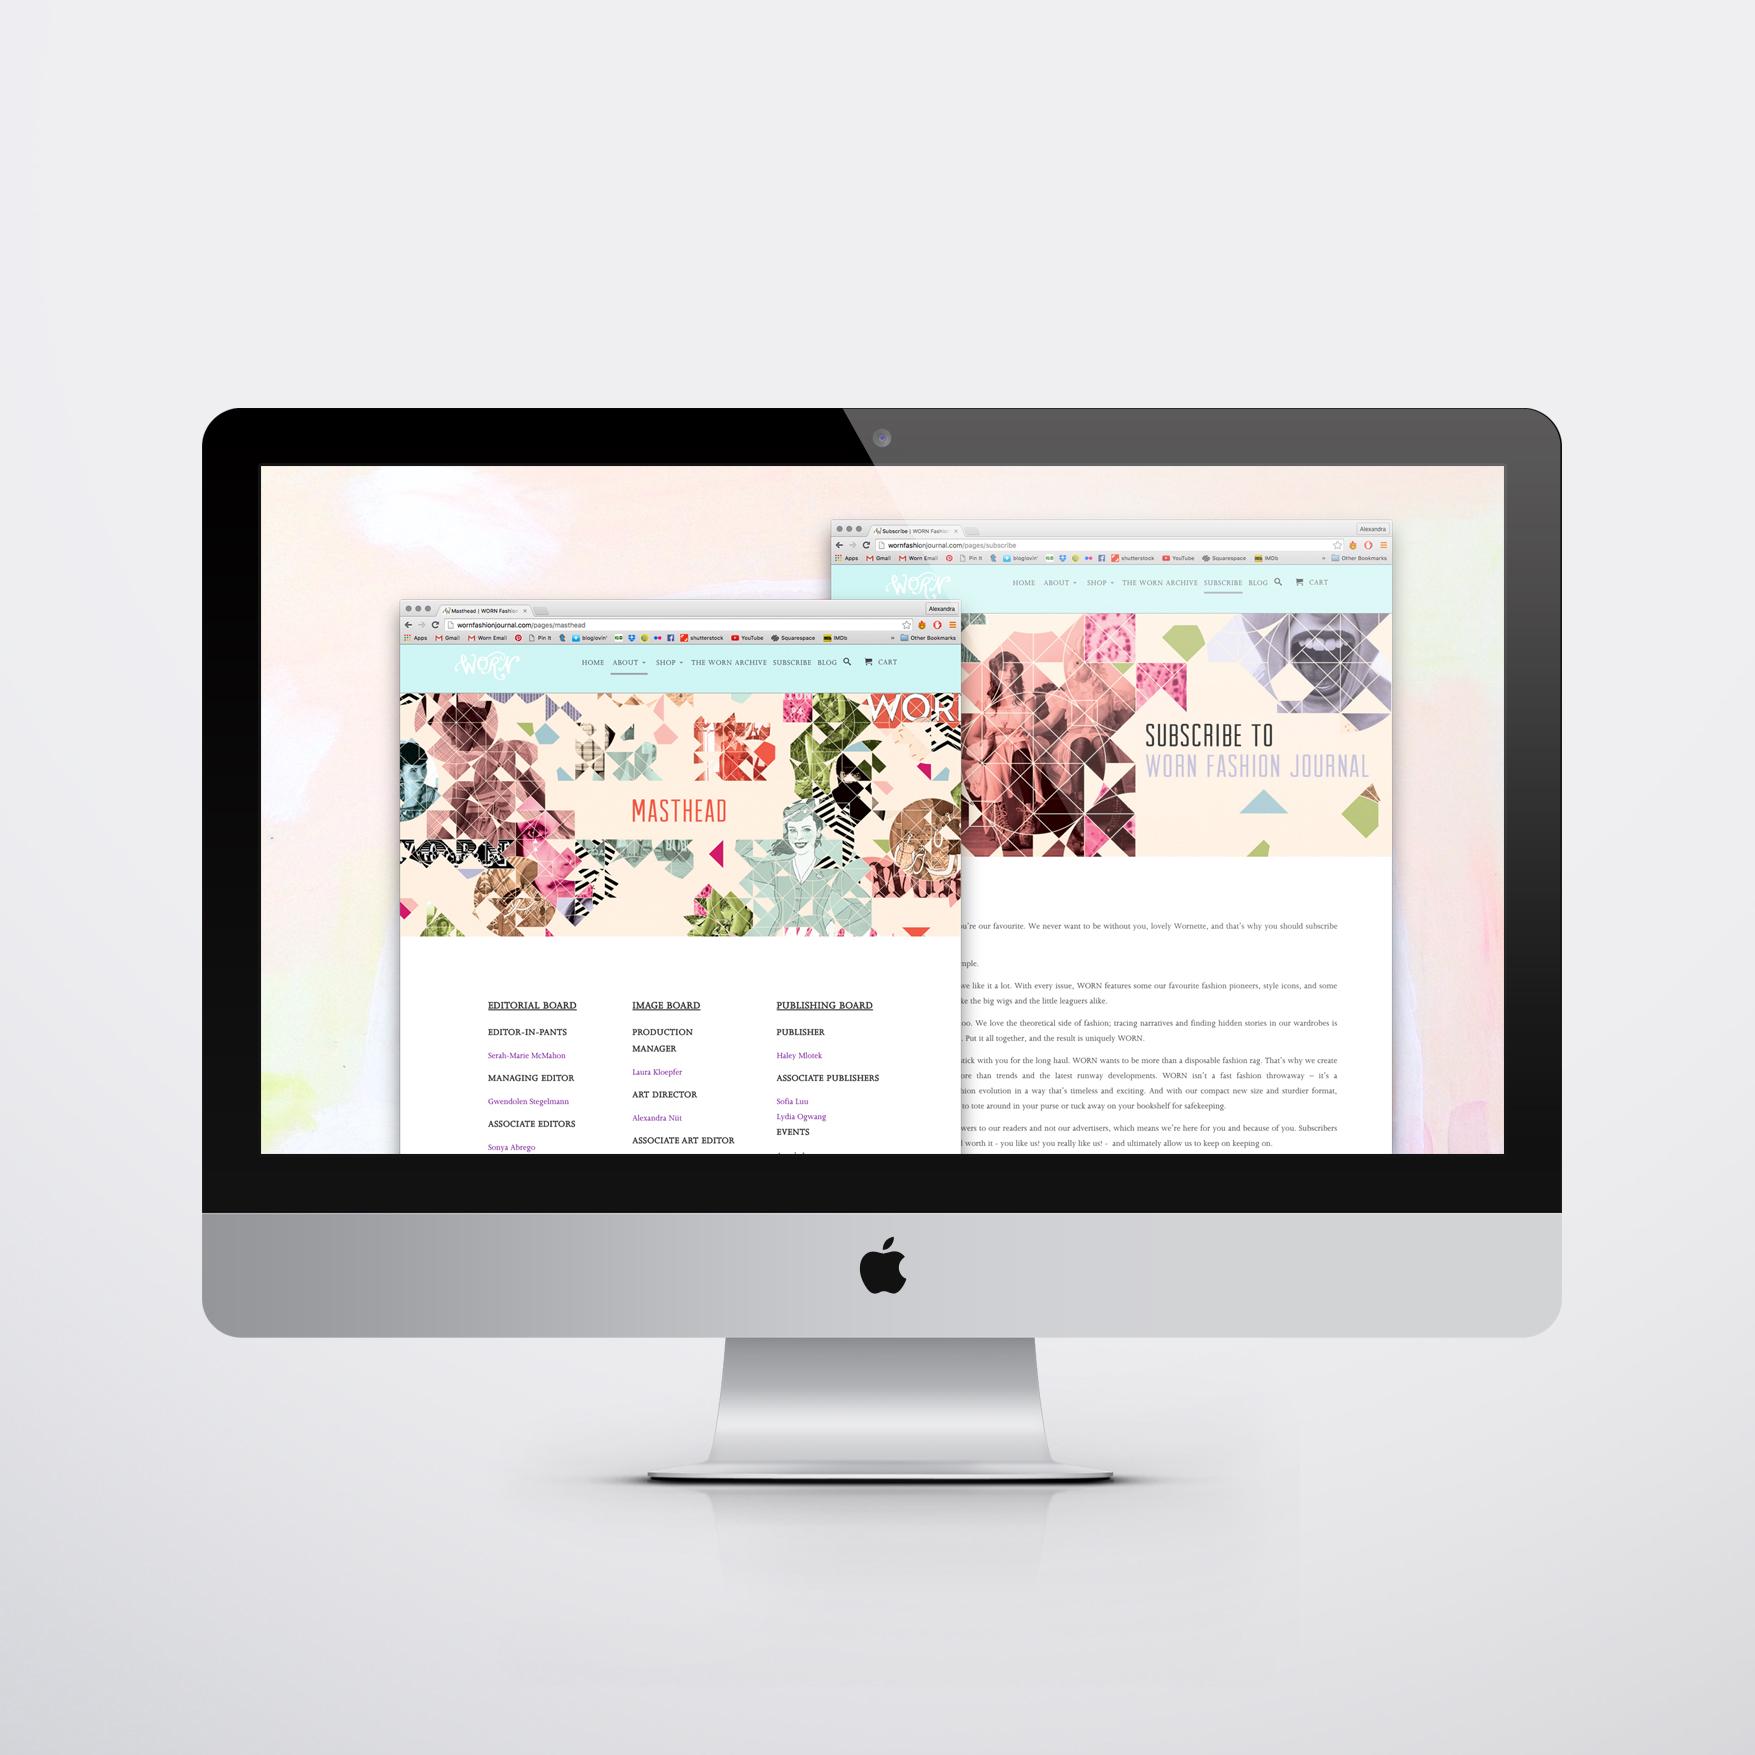 WORN Website Header Graphics